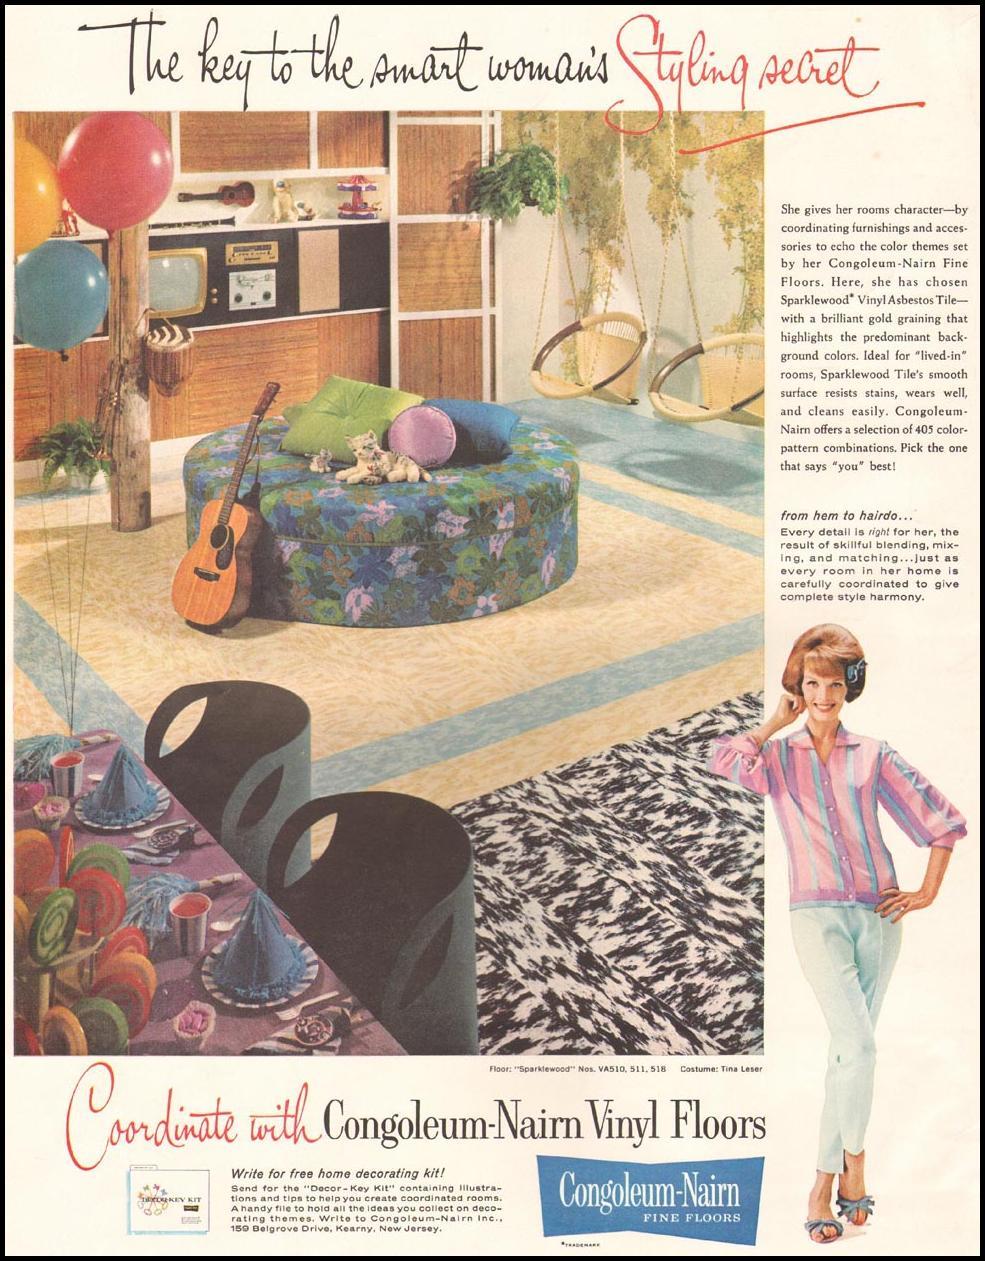 CONGOLEUM-NAIRN VINYL FLOORS LIFE 03/31/1961 INSIDE FRONT